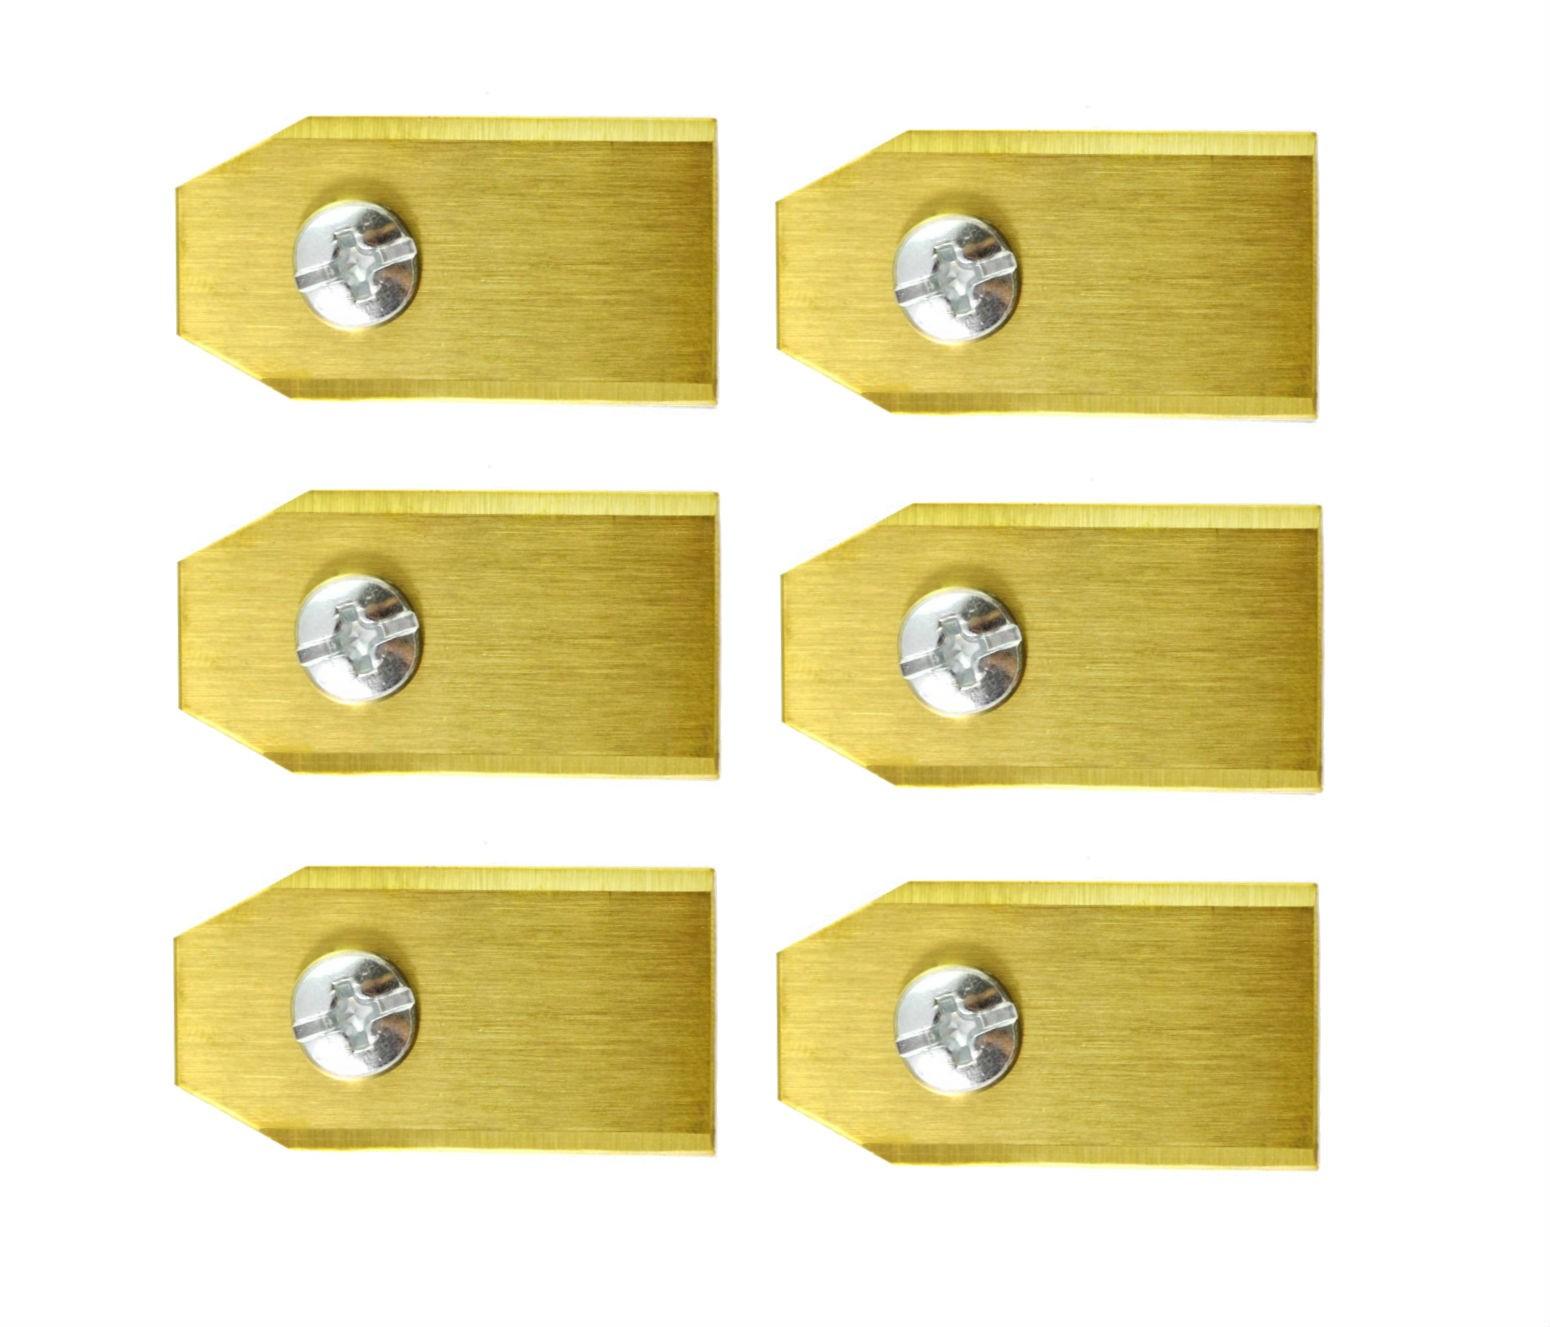 6 geheel titanium Husqvarna mesjes